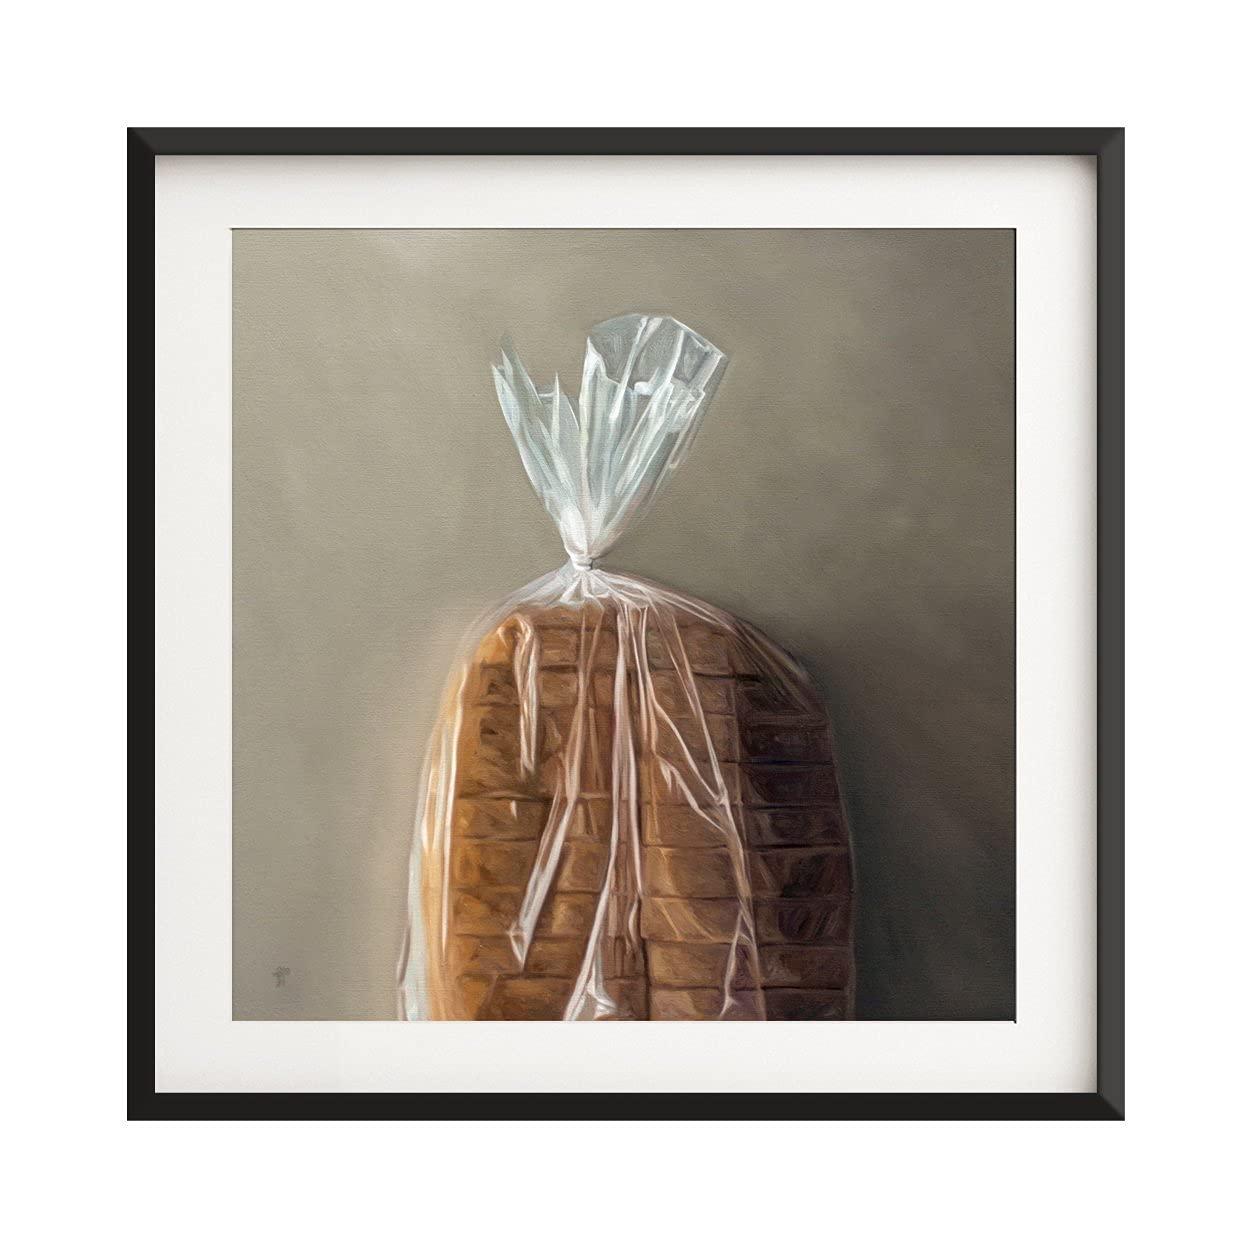 Topics on TV Loaf of Bread Fine Over item handling Print Art